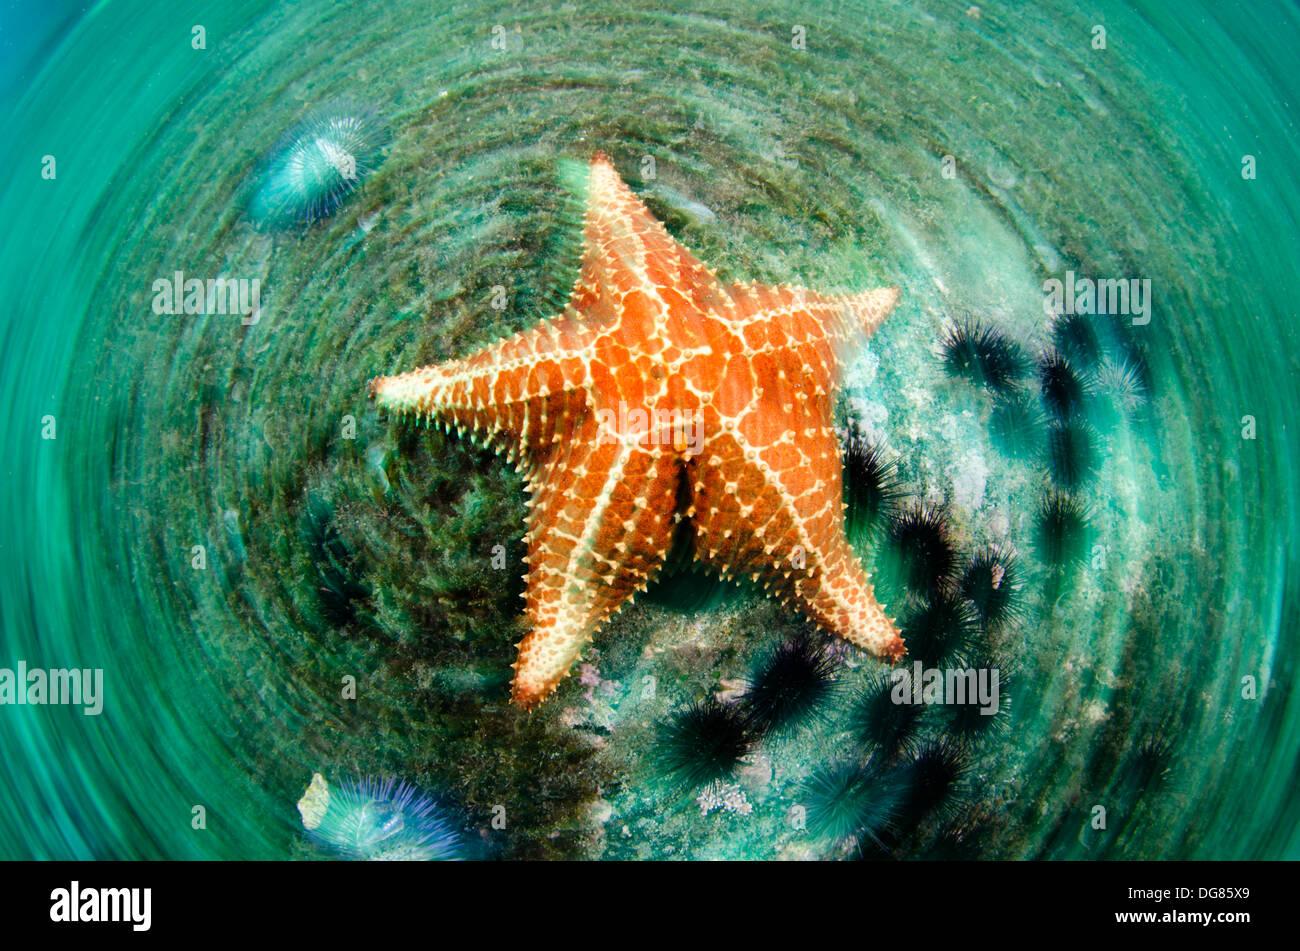 starfish underater blurred motion picture buzios island ilhabela, Sao Paulo, Brazil - Stock Image